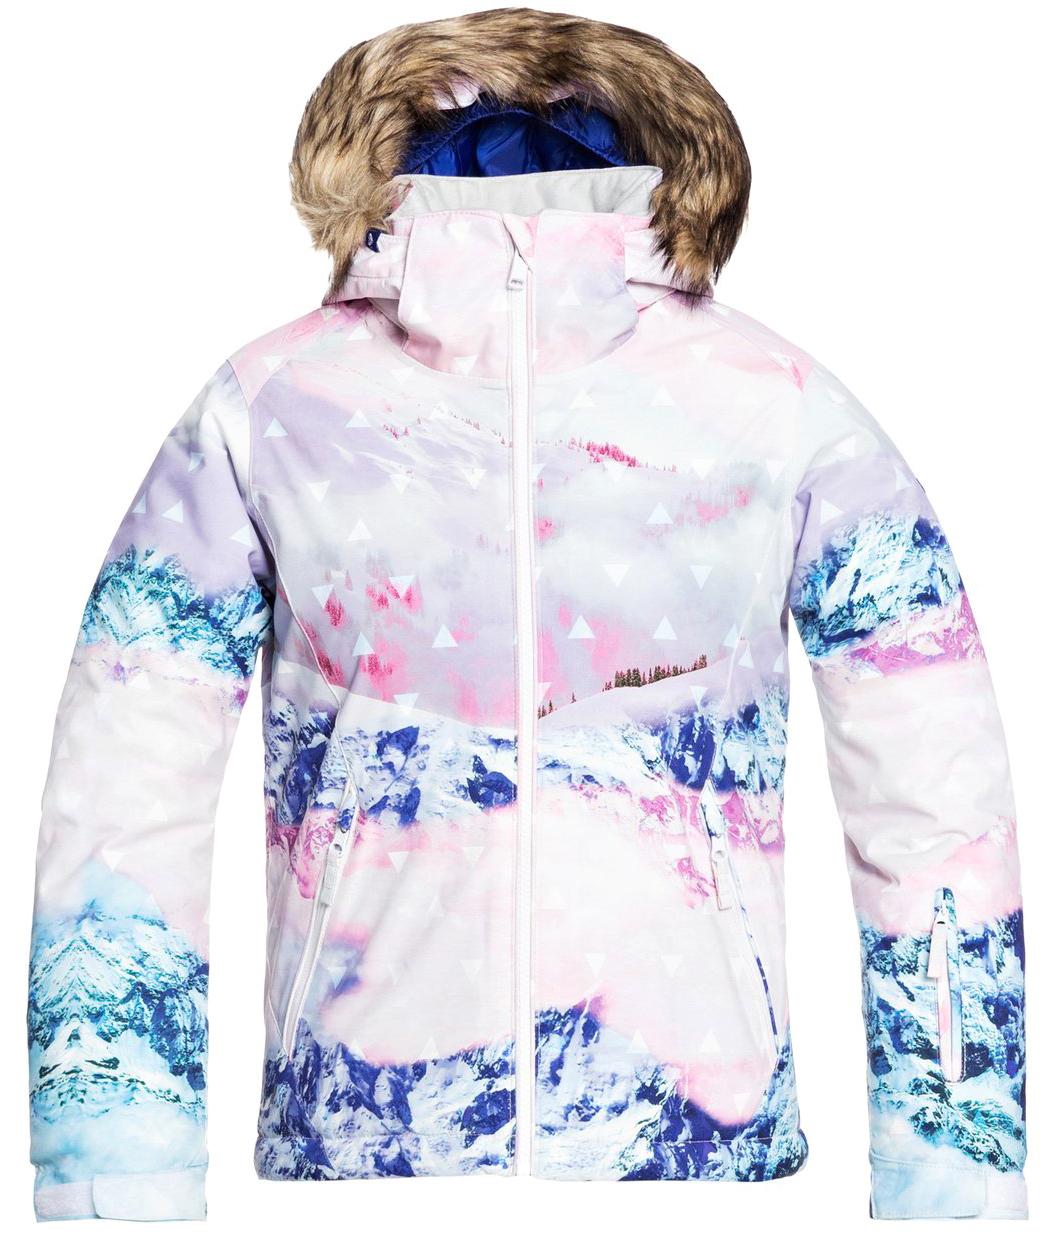 Куртка Сноубордическая Roxy 2020-21 Jet Ski Se Bright White Pyrennes (Возраст:8)